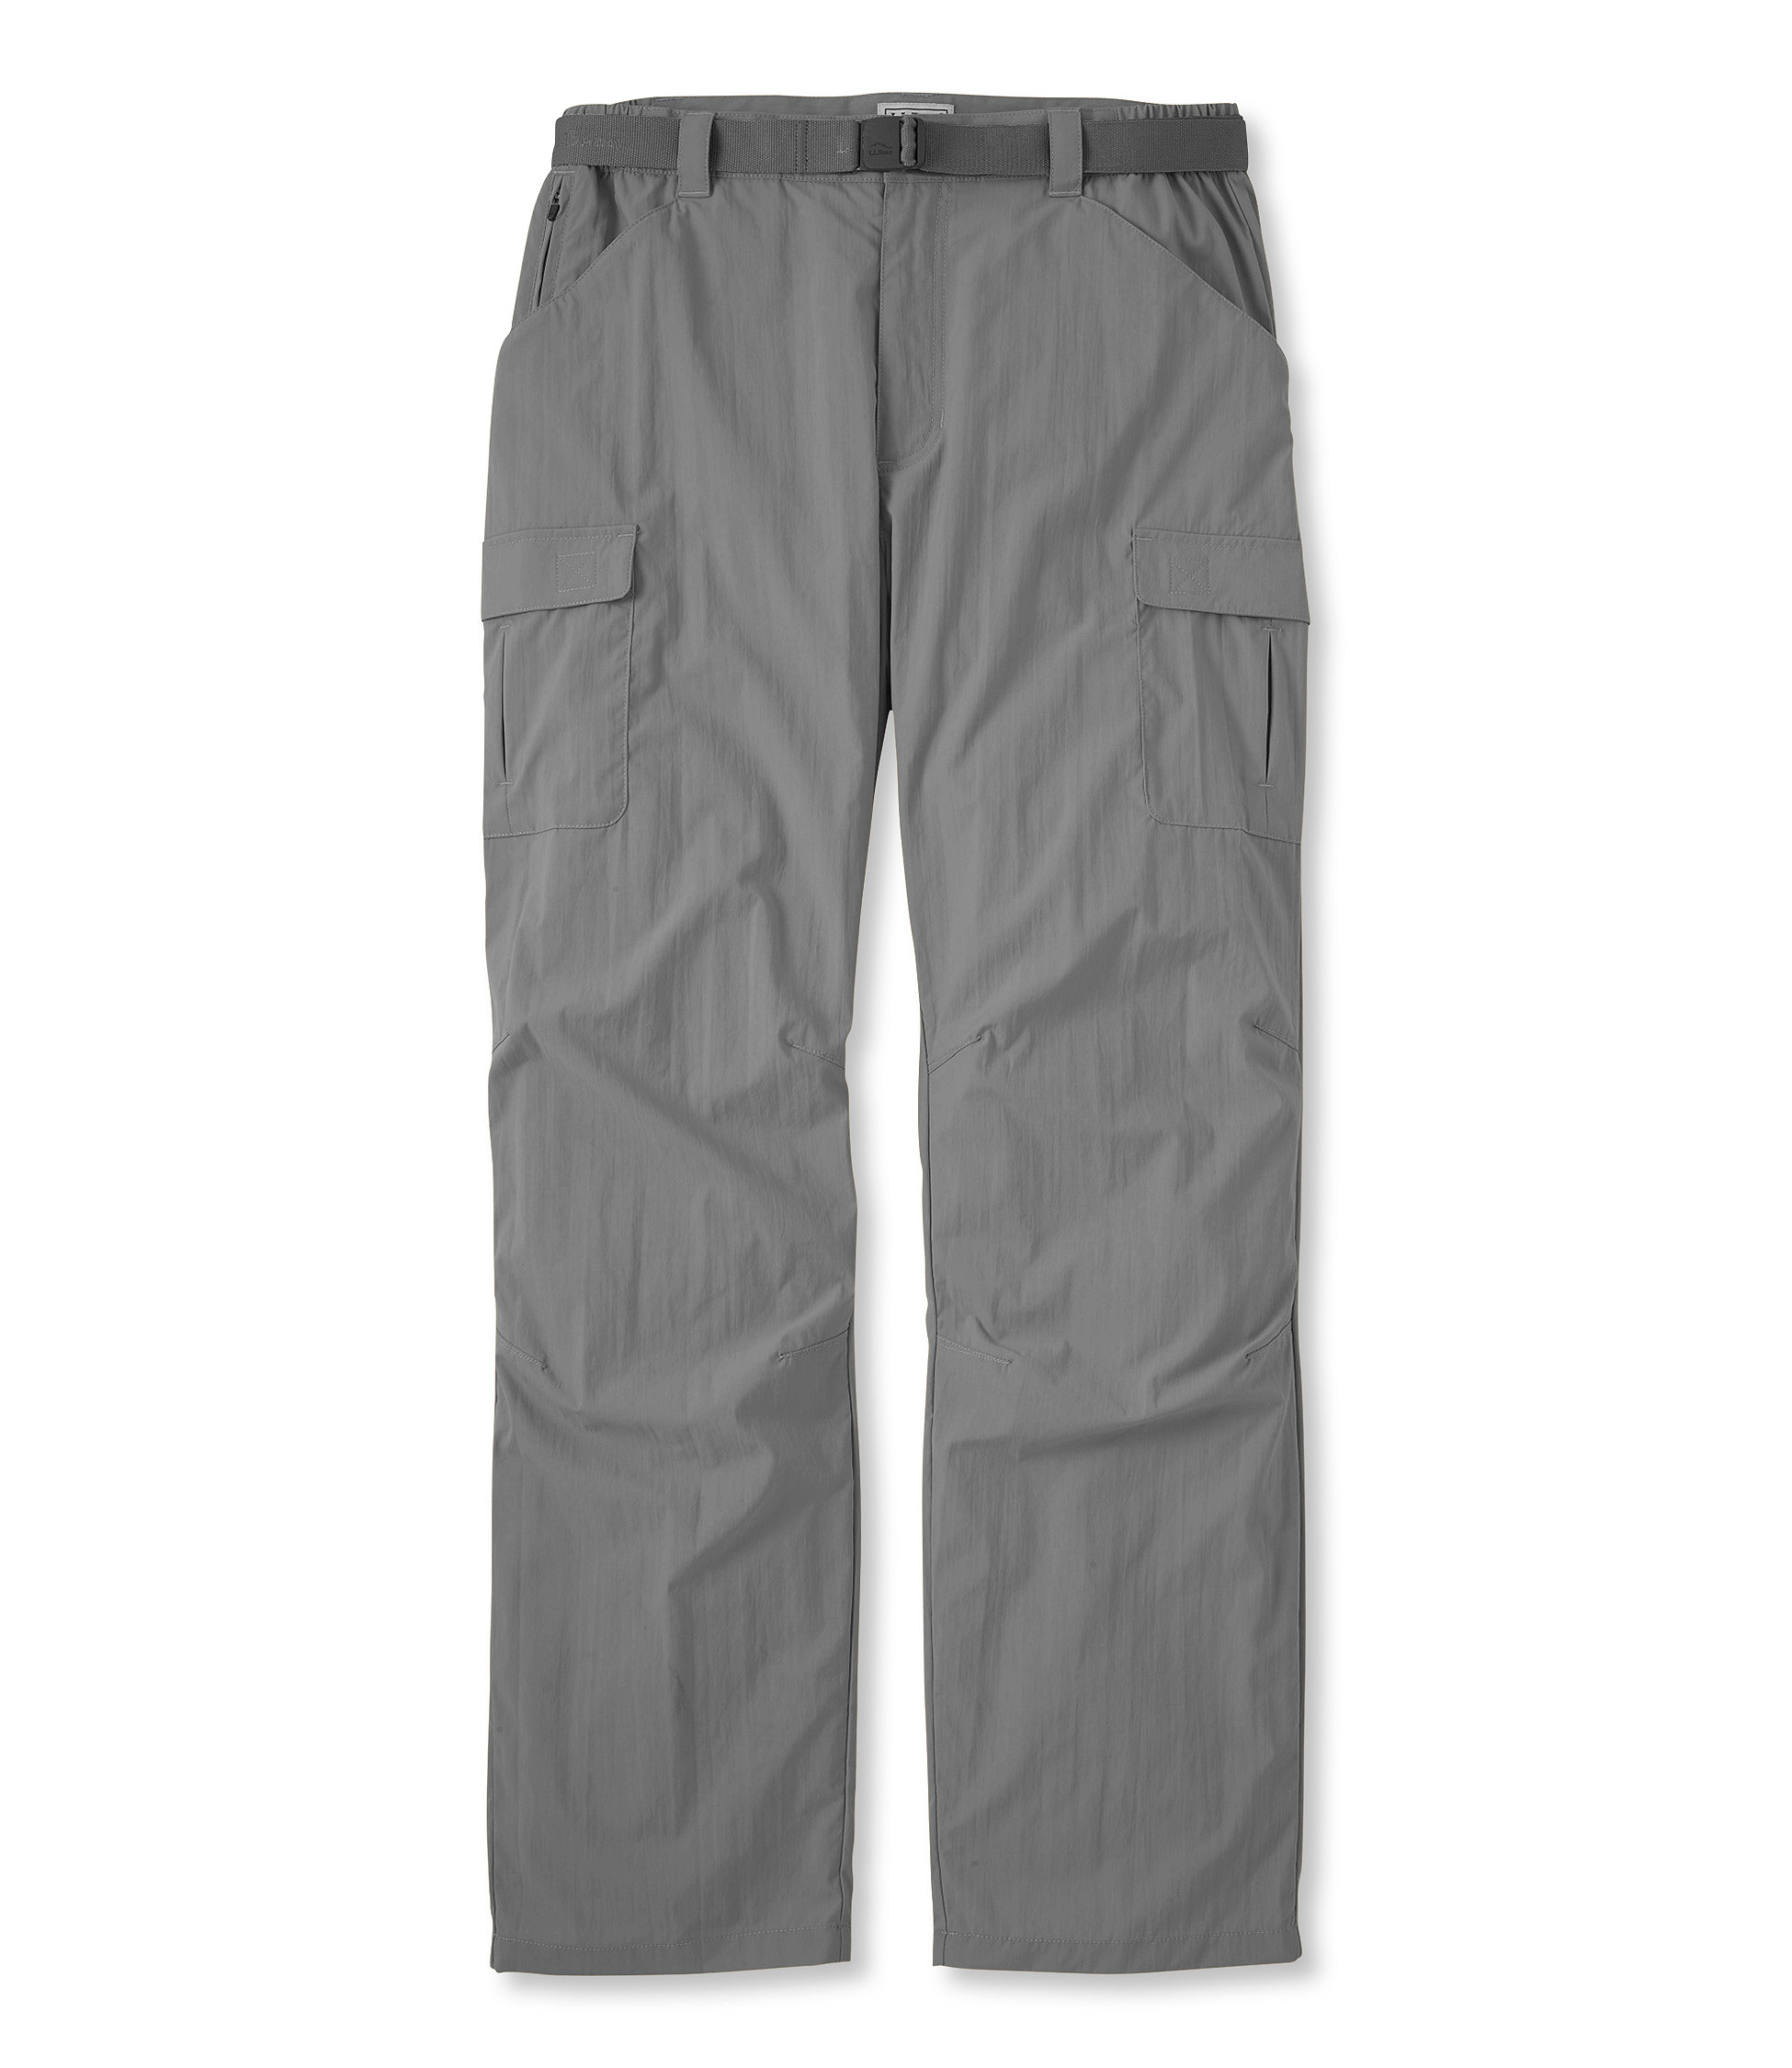 L.L.Bean Tropicwear Pants